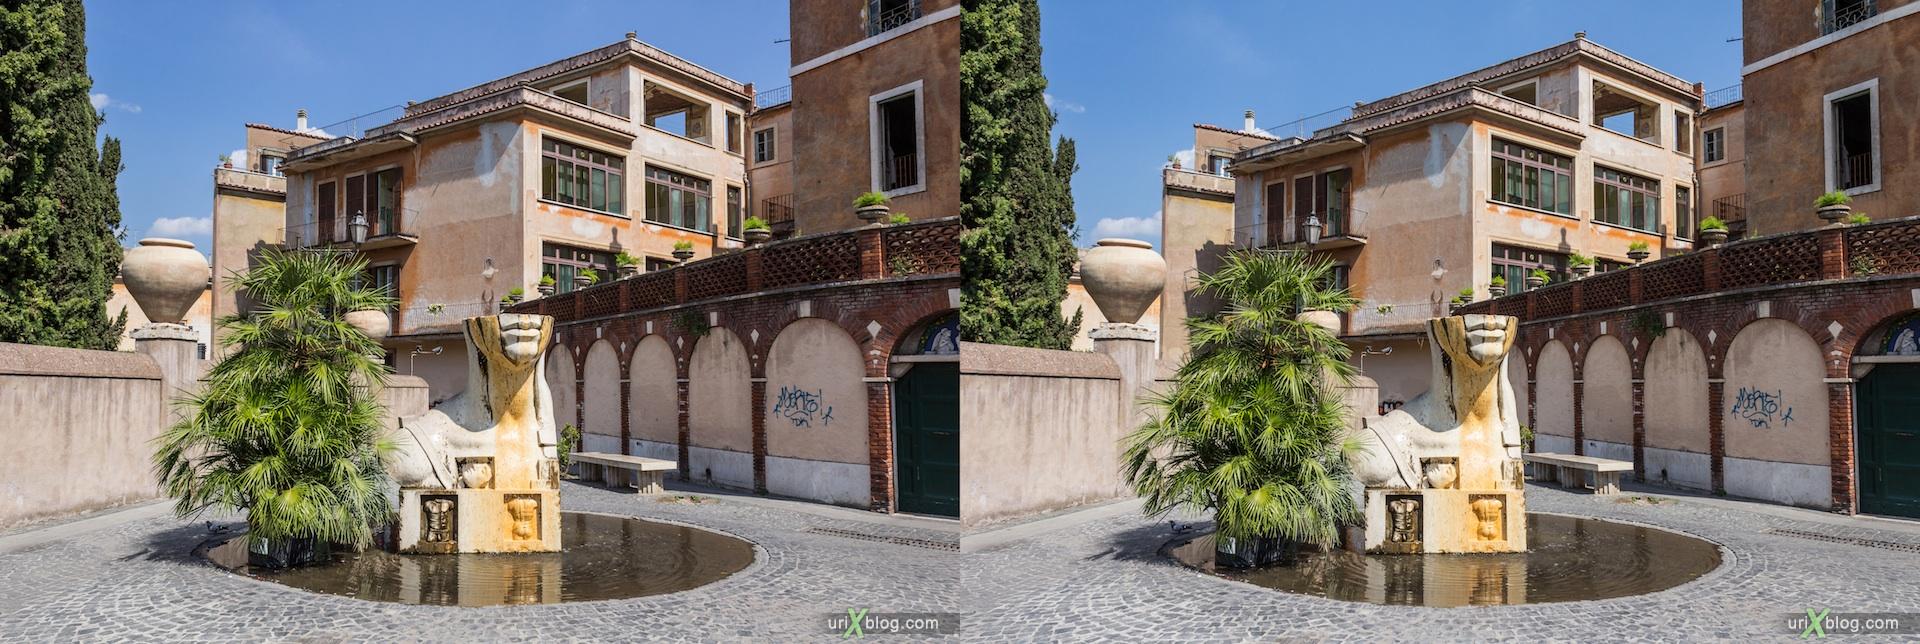 2012, вилла Дэстэ, Тиволи, Италия, фонтан, villa D'Este, Tivoli, Italy, fountain, 3D, stereo pair, cross-eyed, crossview, стерео, стереопара